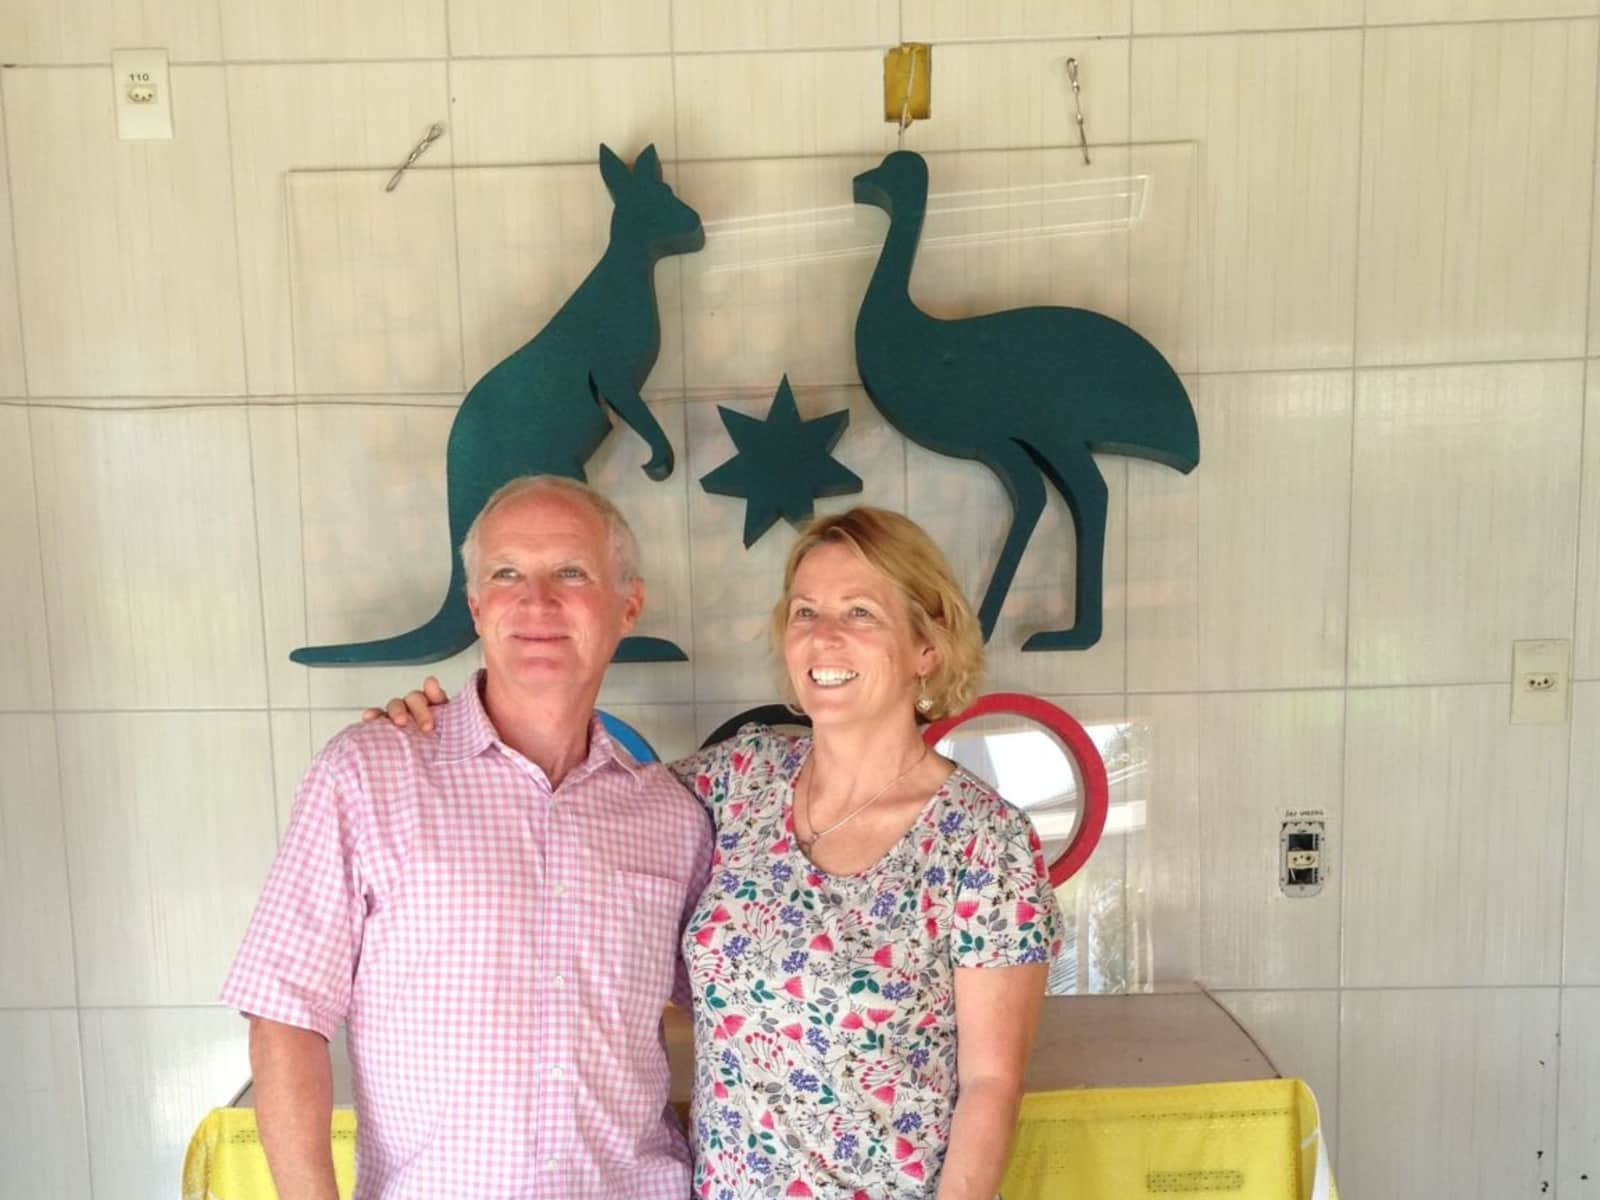 Mollie & Tom from Perth, Western Australia, Australia